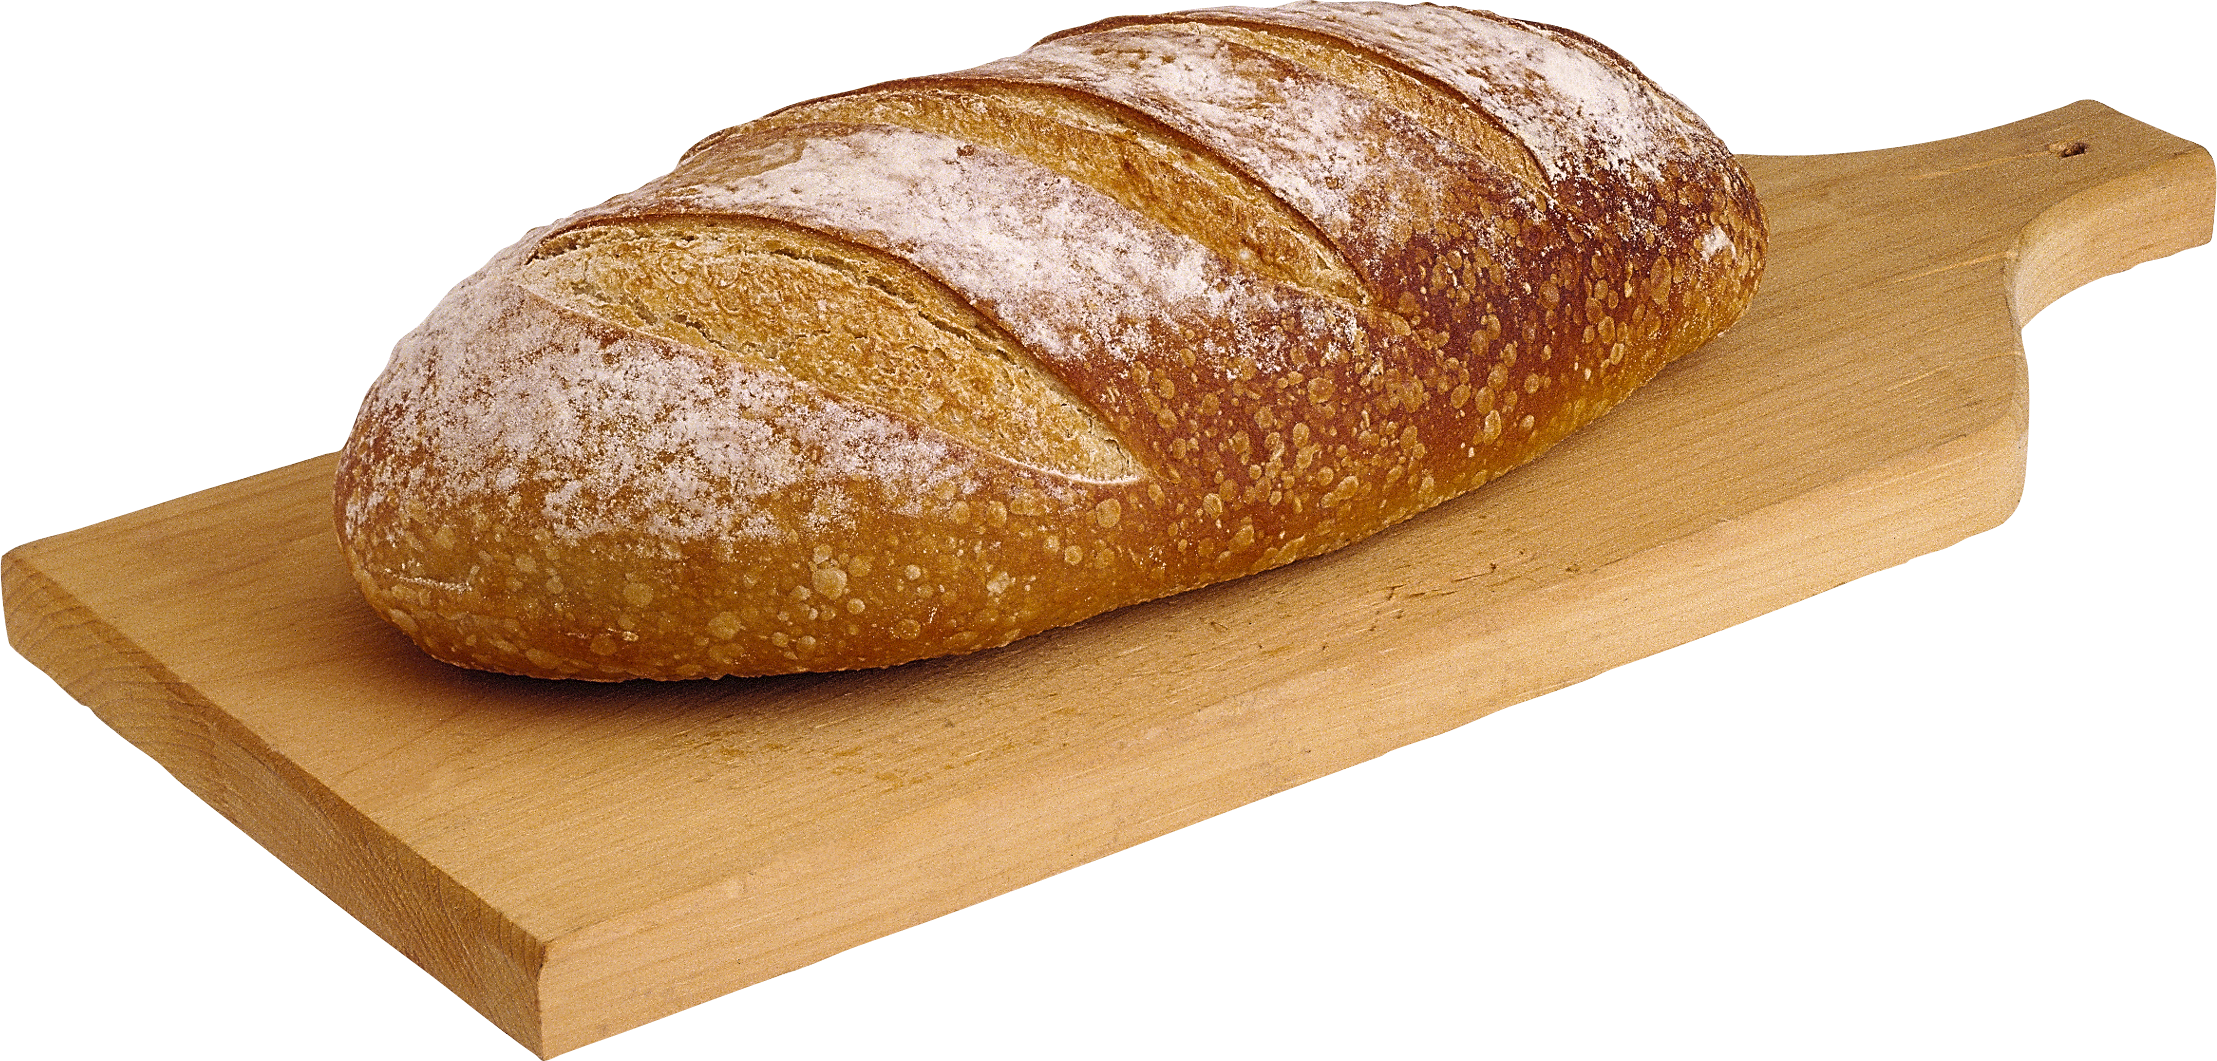 vector transparent Png images free download. Transparent bread